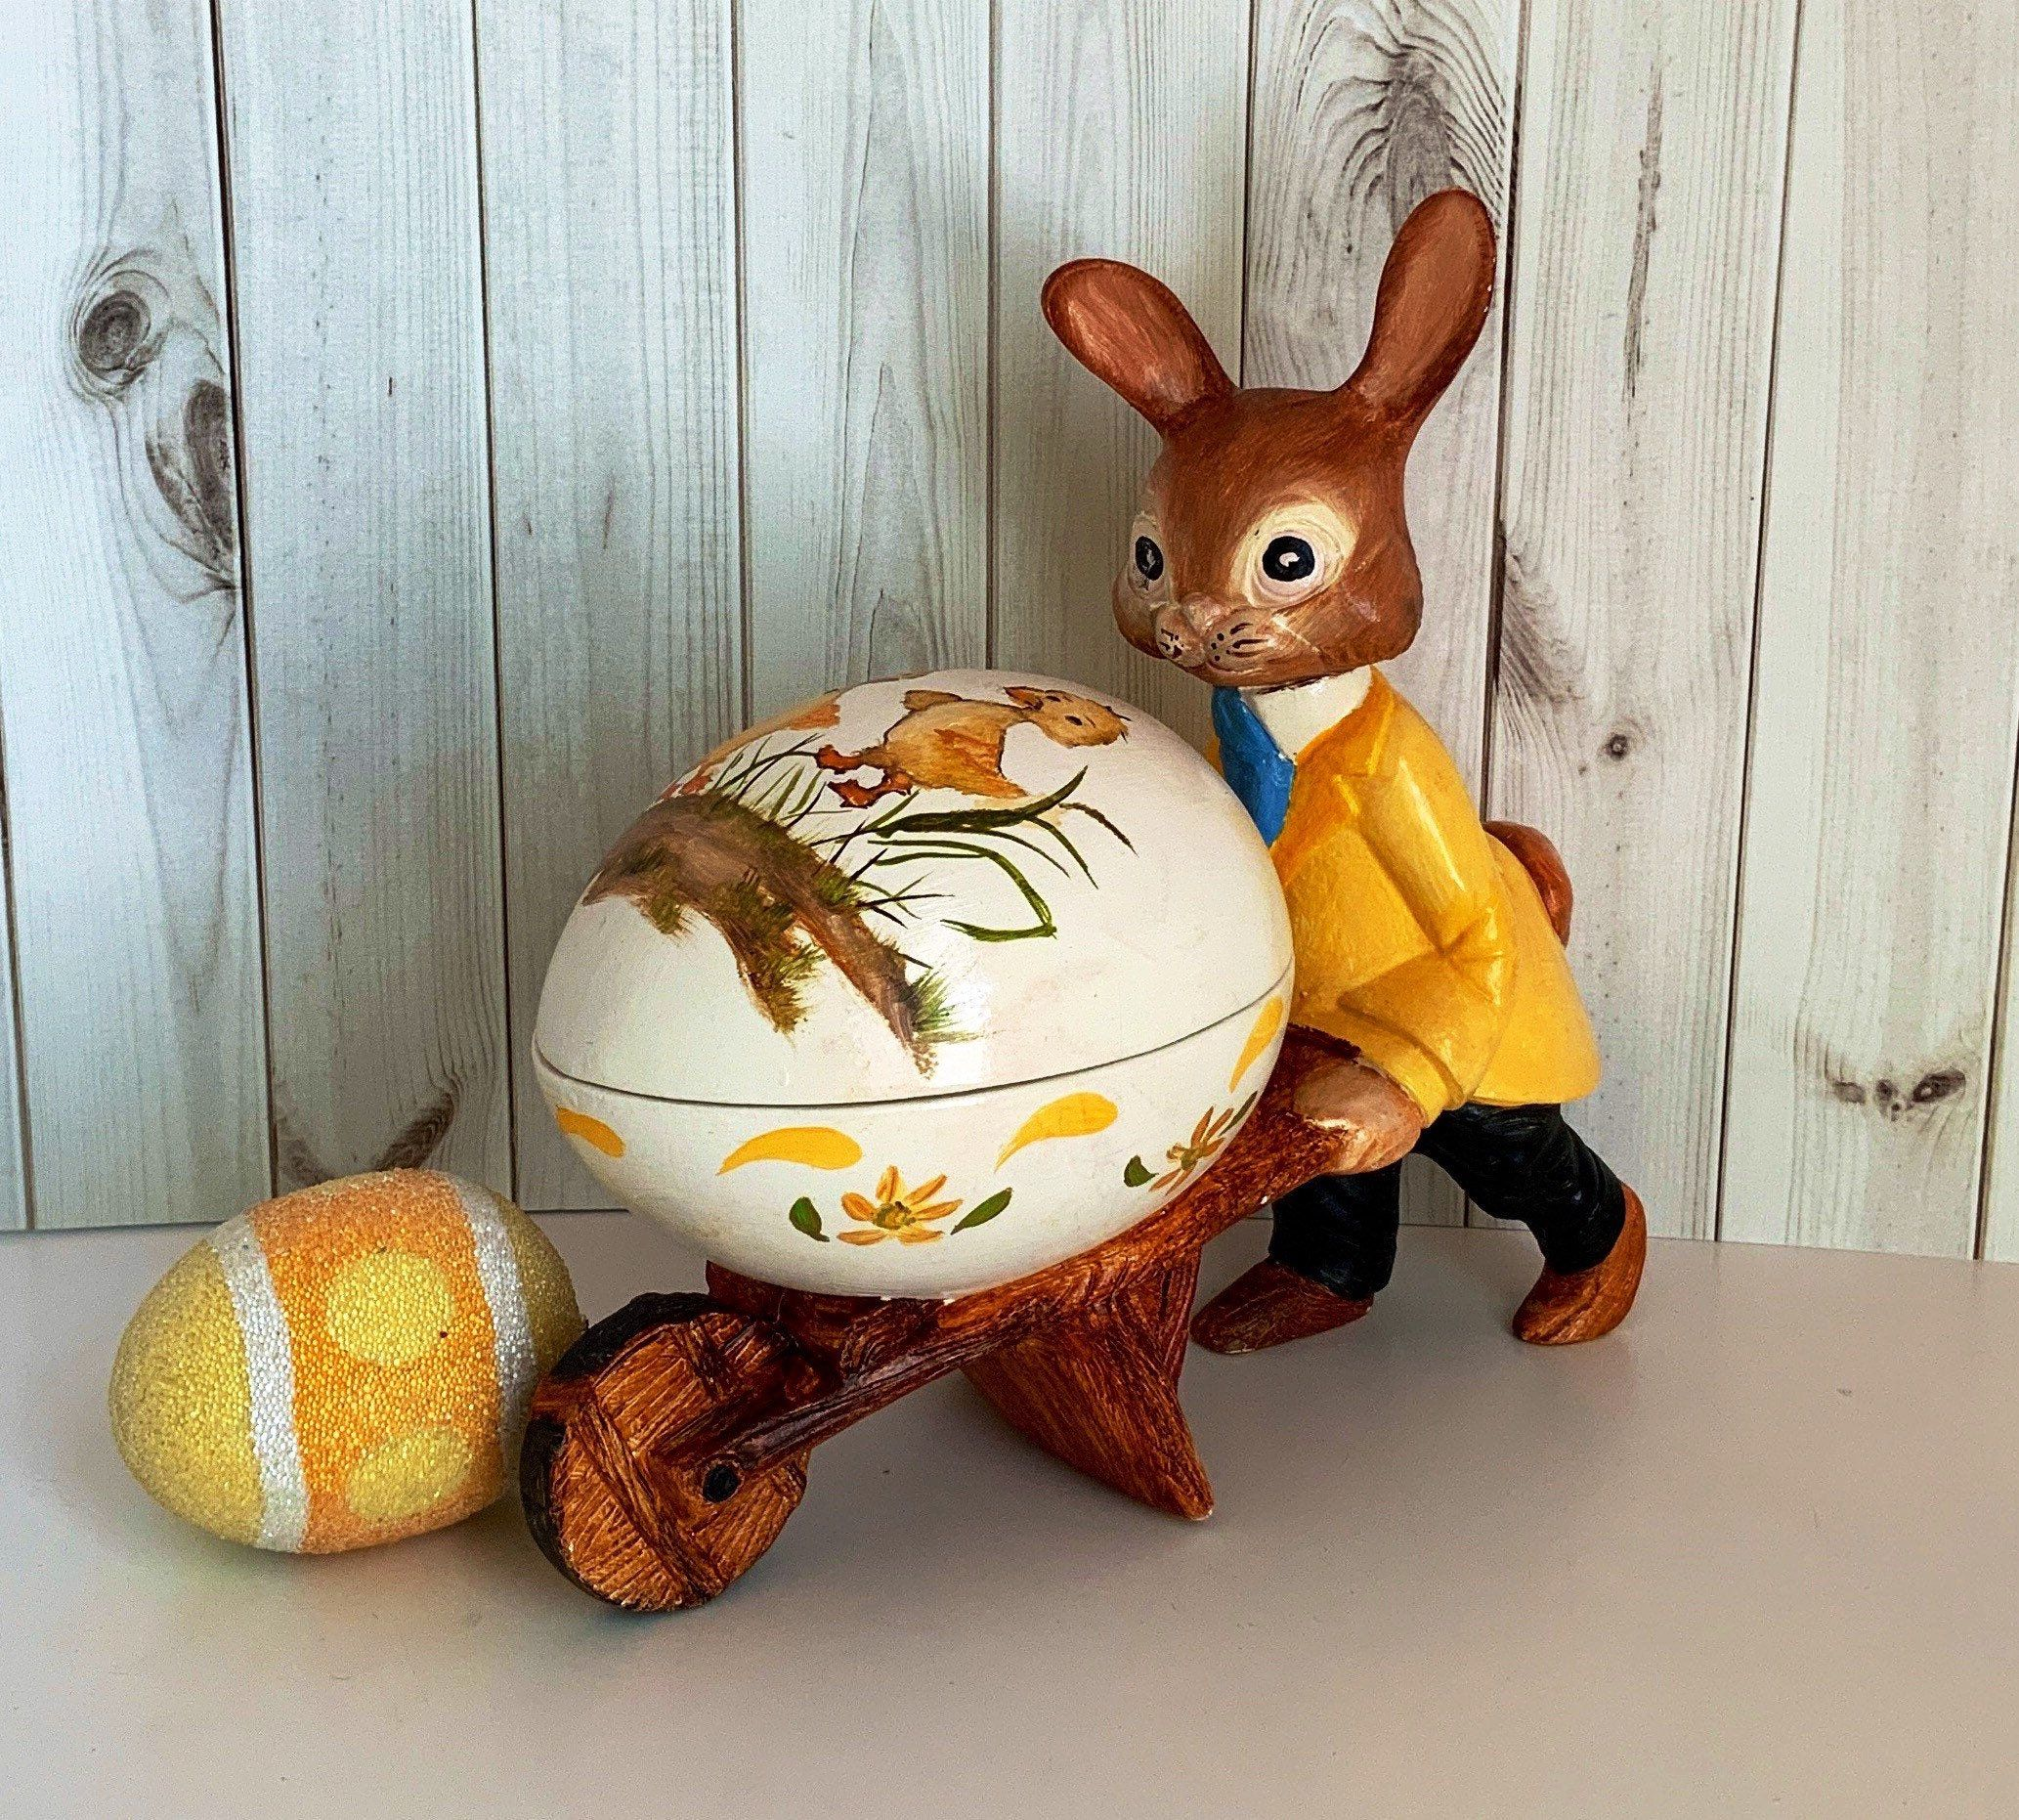 Vintage 1970s Easter Bunny Pushing Wheelbarrow Hand Painted